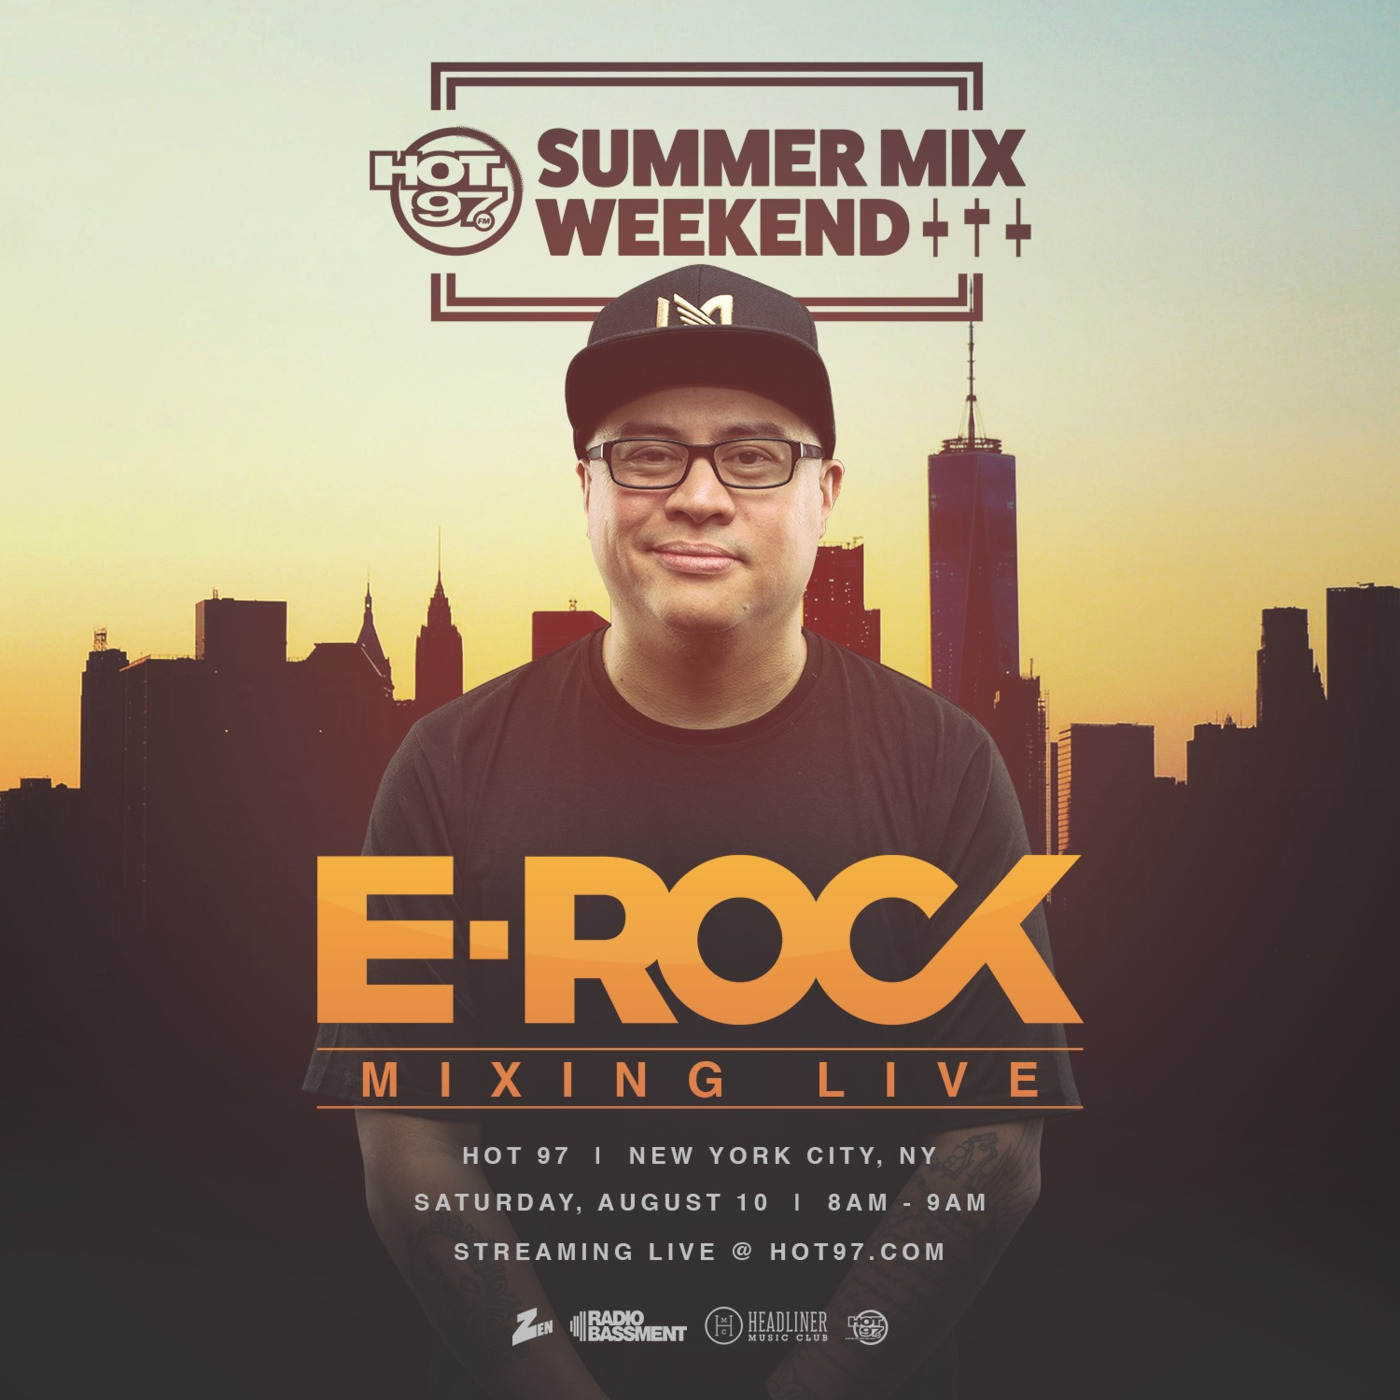 SPECIAL EPISODE *** DJ E-ROCK - HOT 97 NYC SUMMER MIX